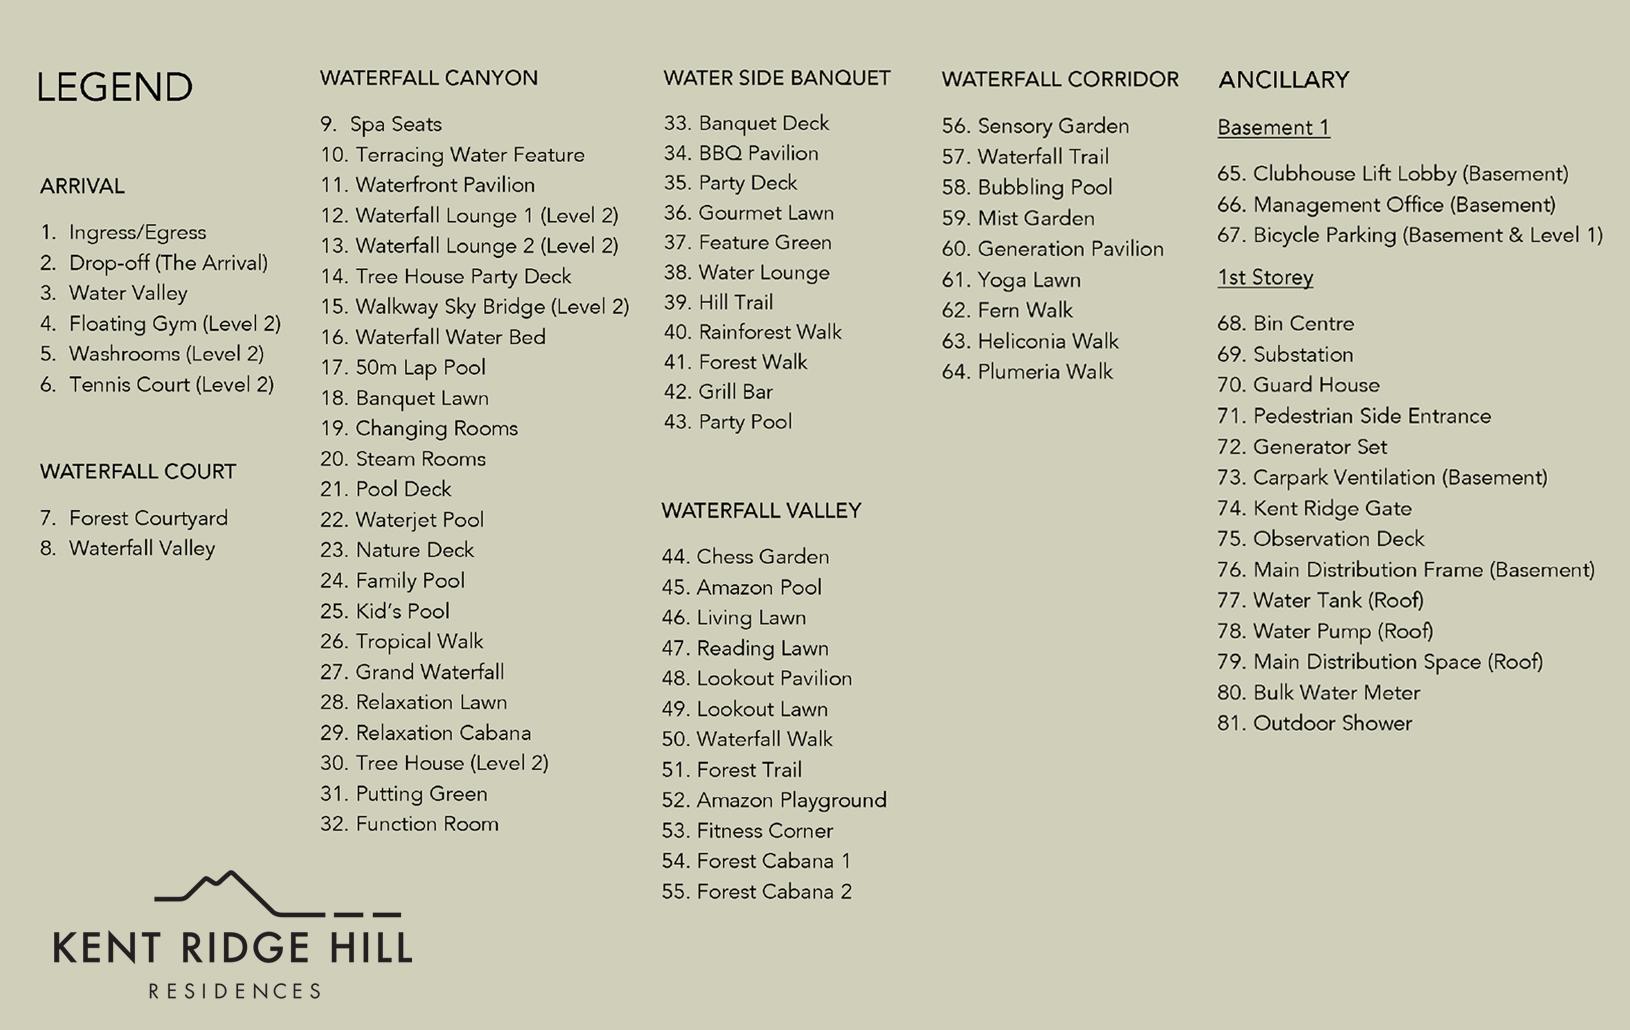 Kent Ridge Hill Residences Site Plan Legend